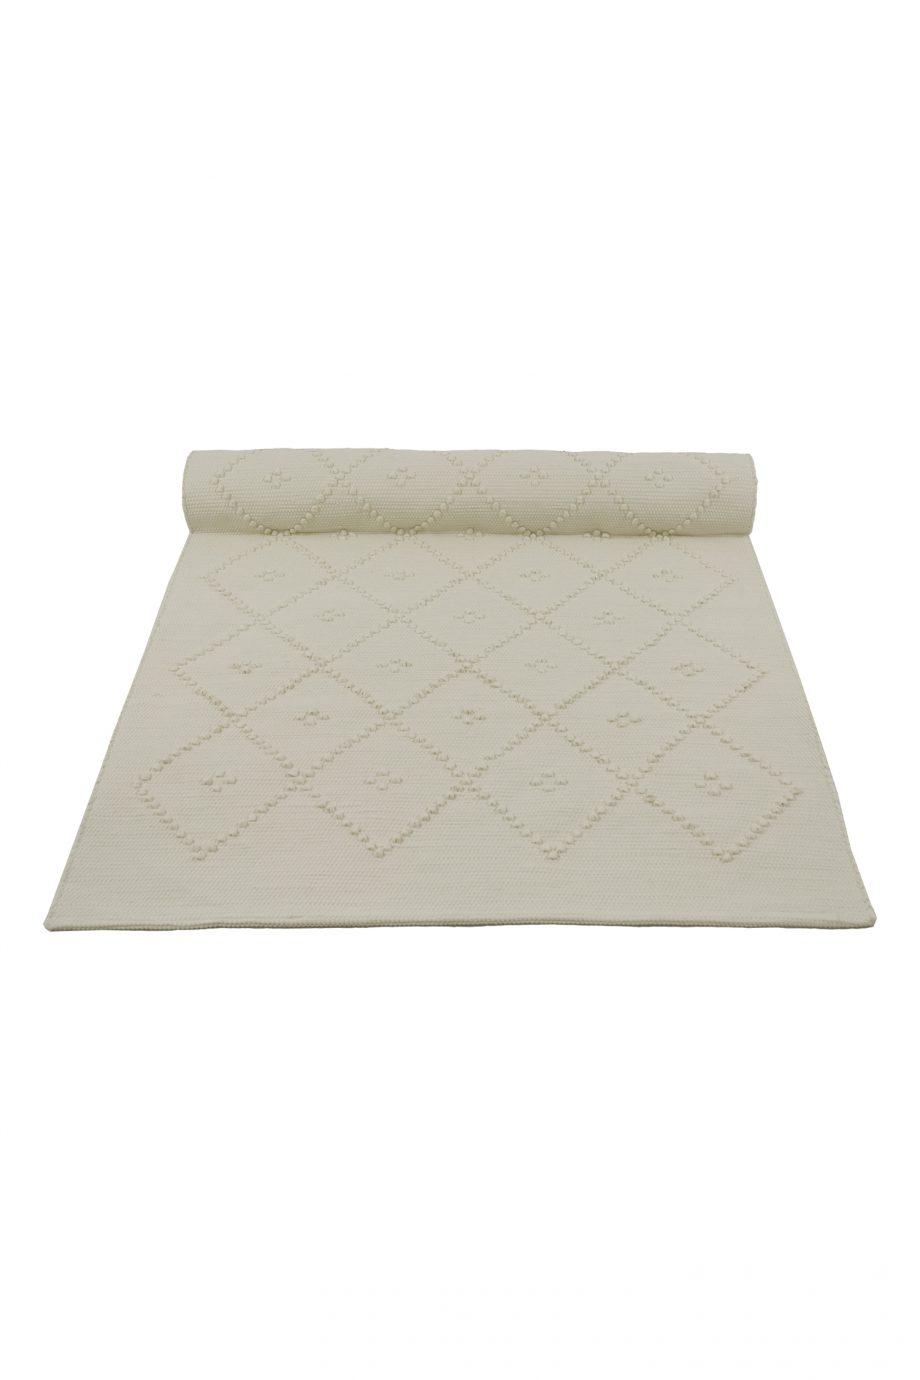 diamond off-white geweven katoenen kleed medium